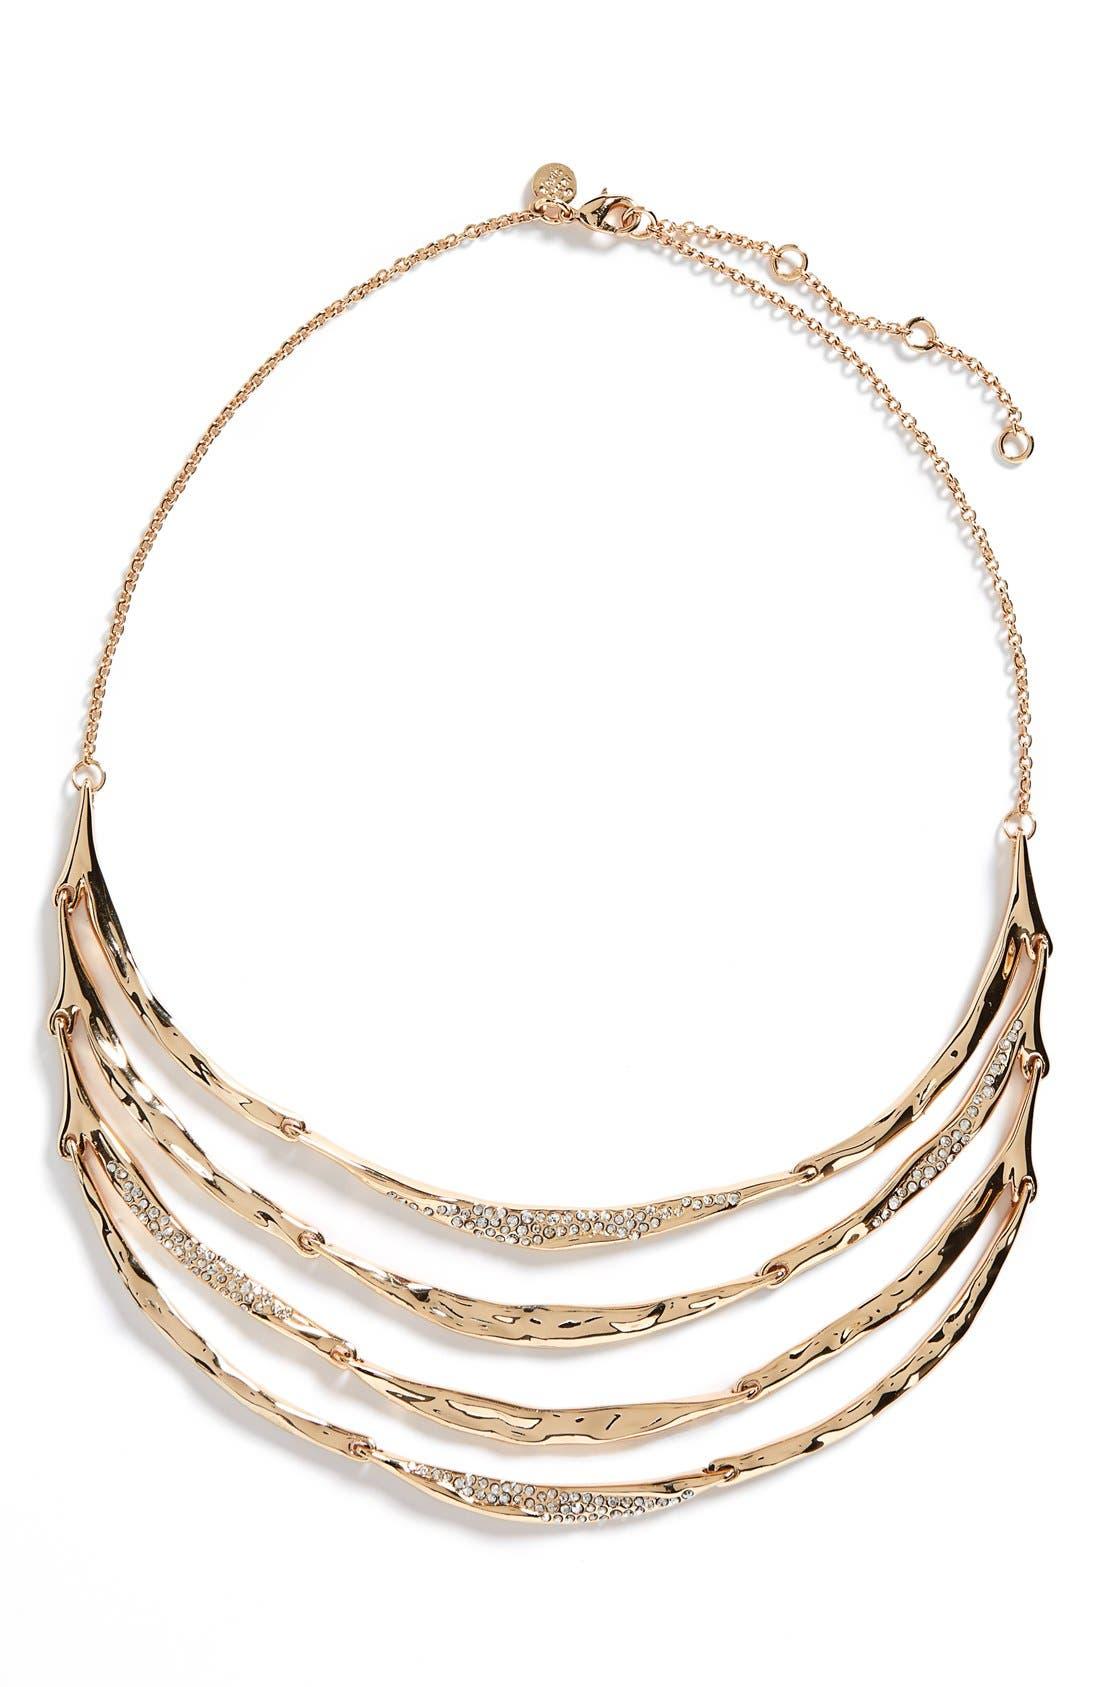 Main Image - Miss Havisham - Liquid' Tiered Bib Necklace